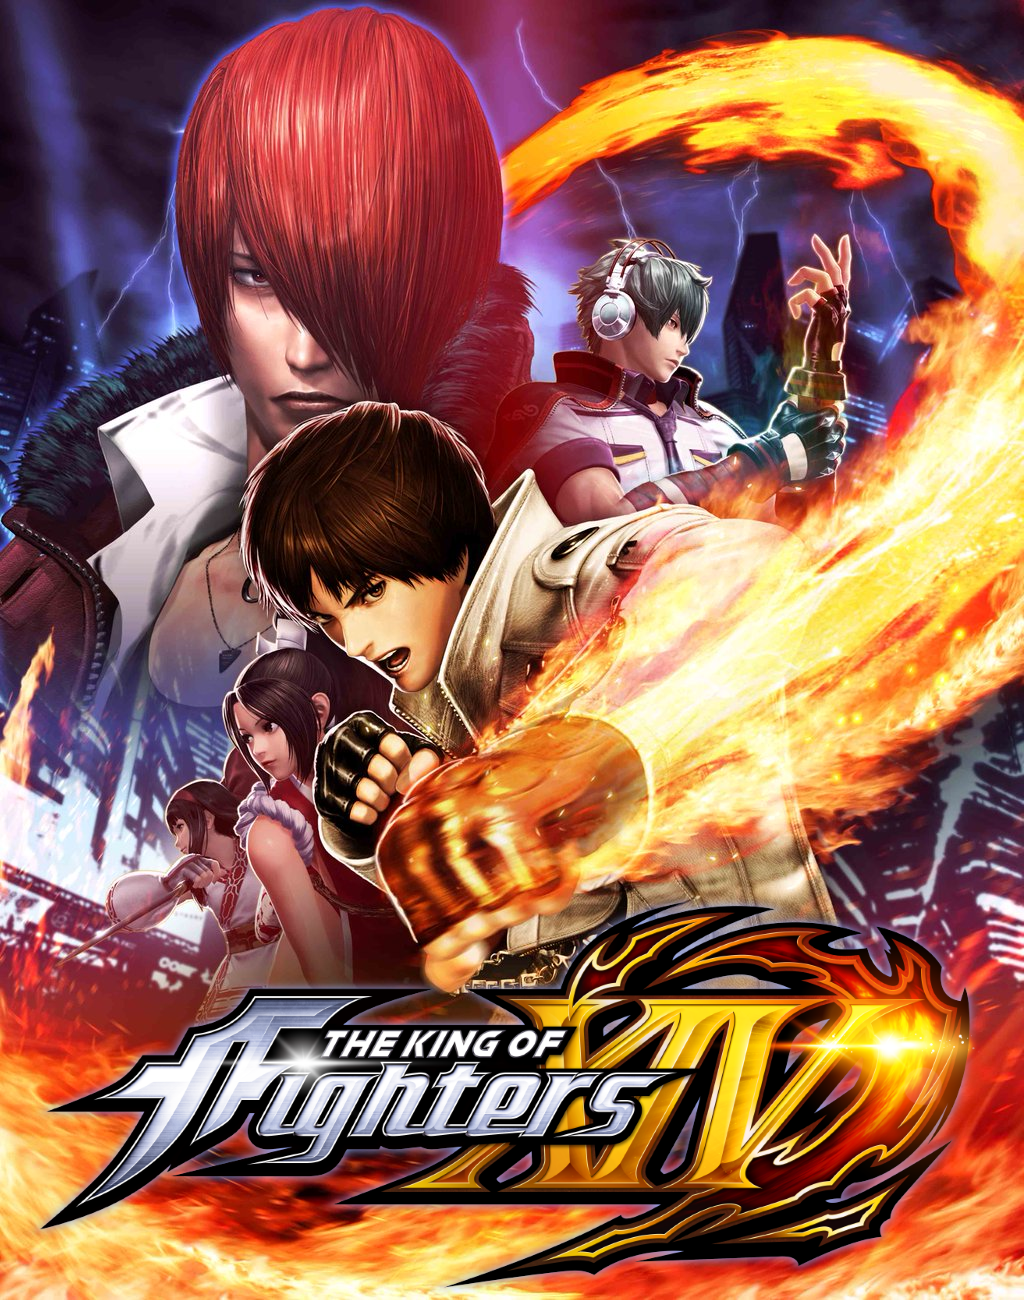 Altair-Blitz-Star/Propuesta de Doblaje: The King of Fighters XIV (DLC)